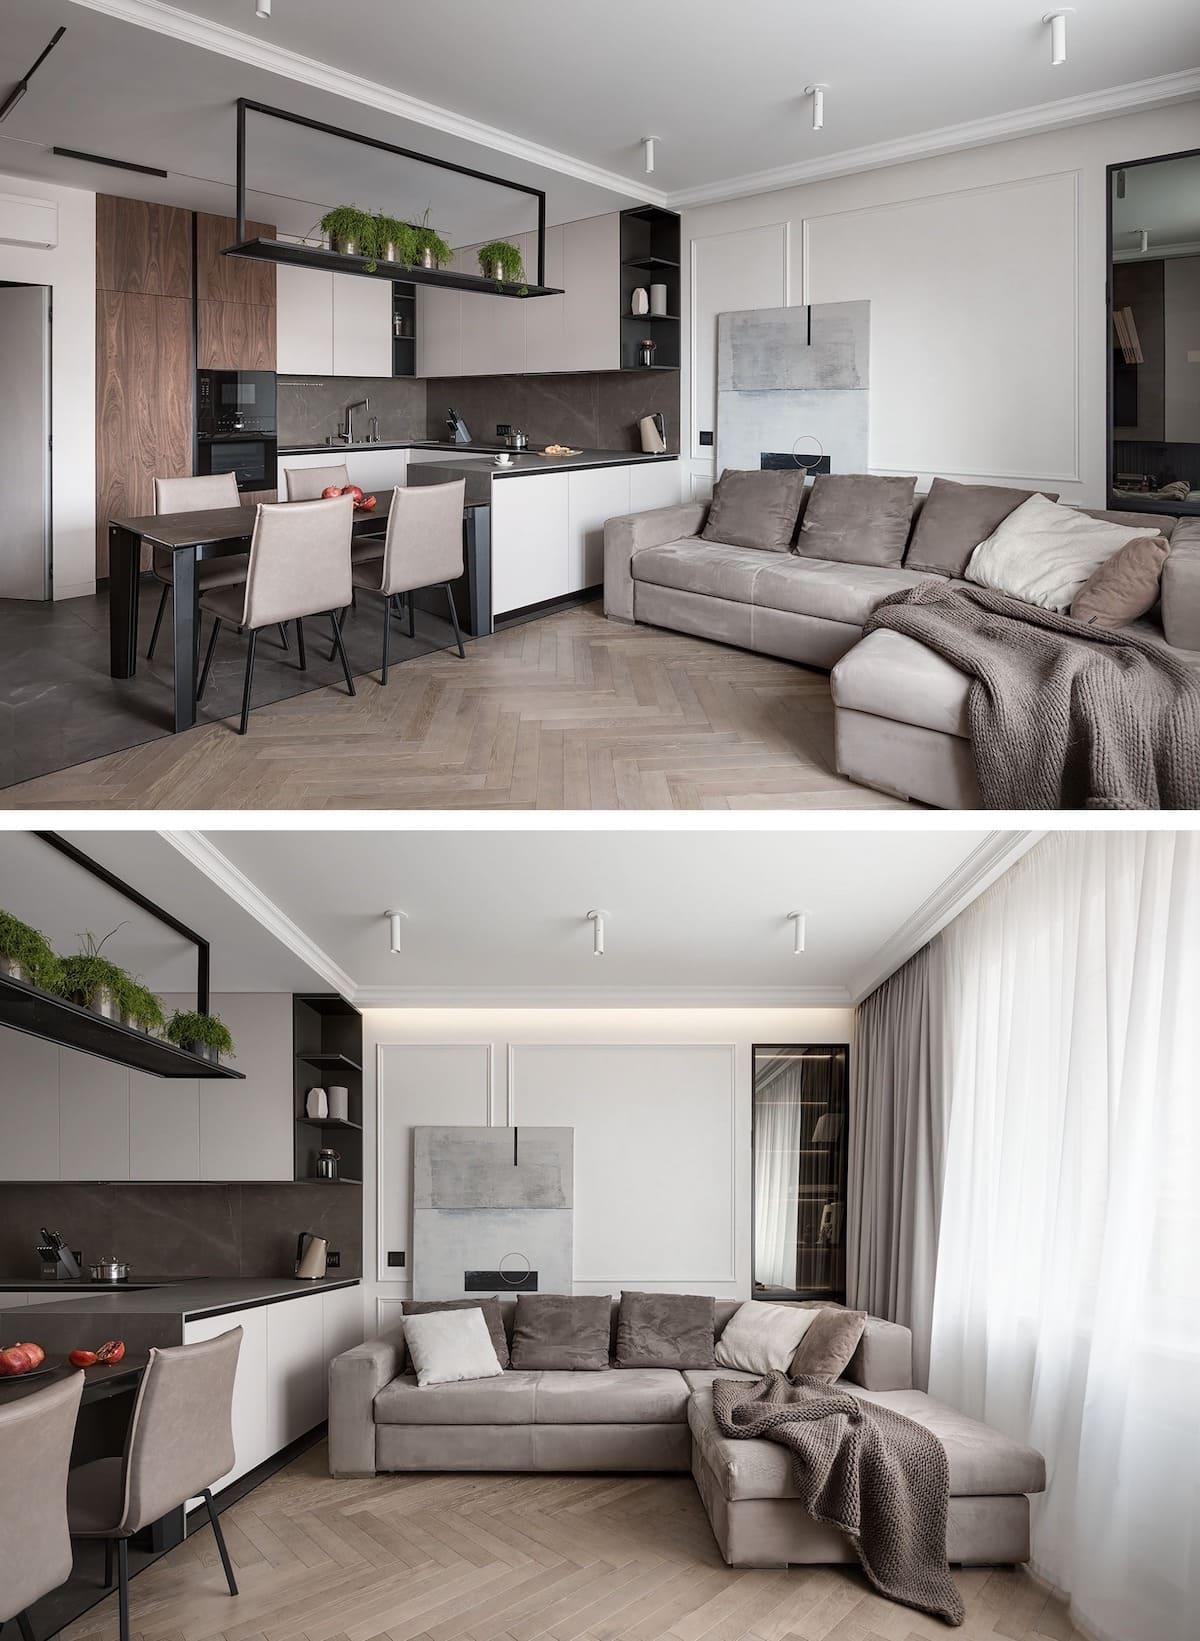 дизайн интерьера модной квартиры фото 53